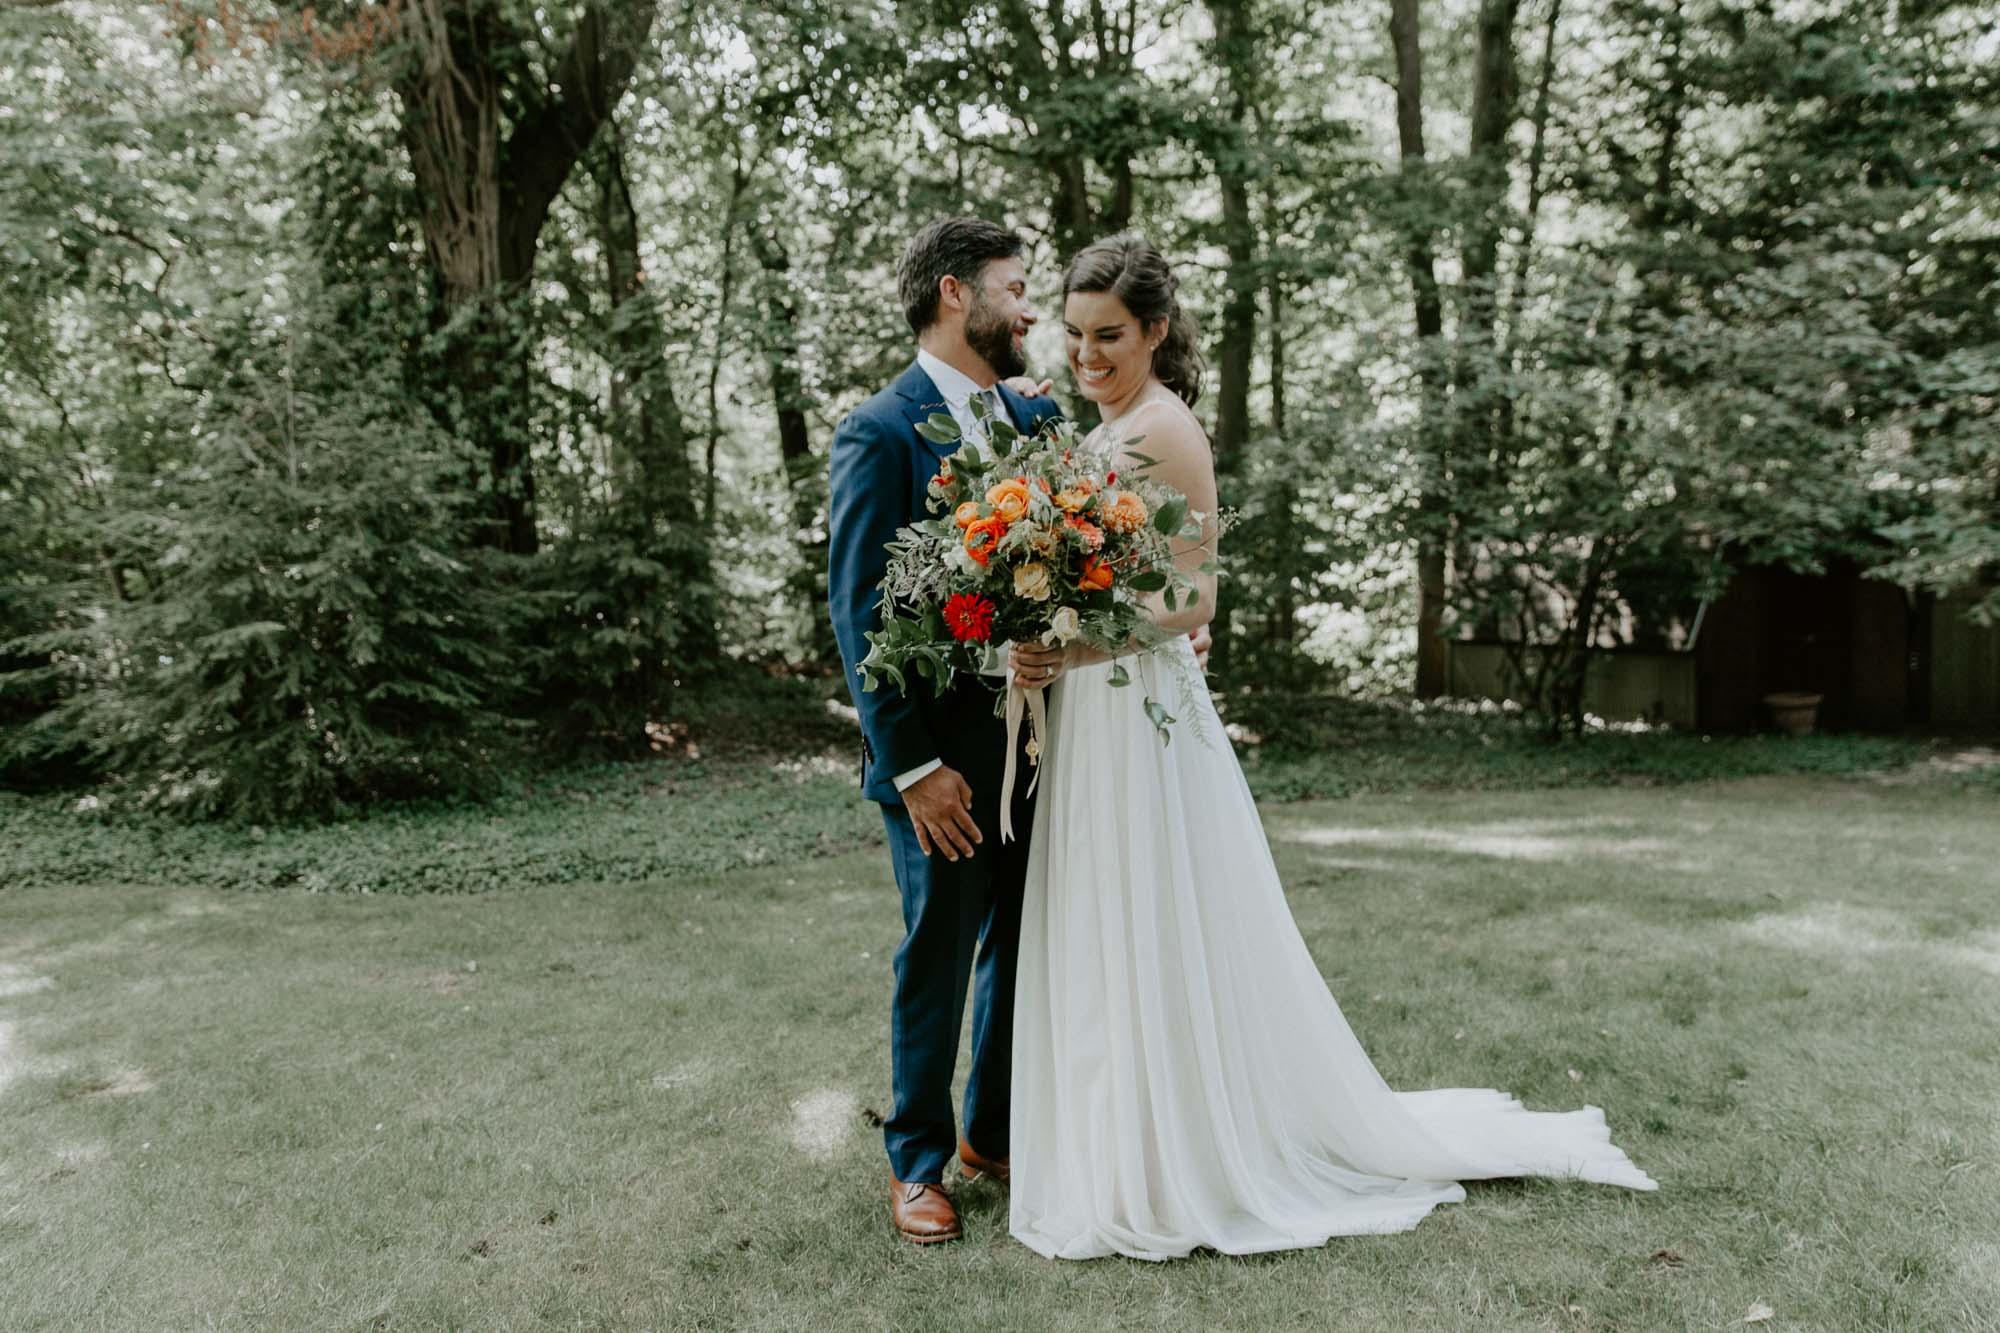 journeyman_distillery_wedding_photographer_chicago_il_wright_photographs-6040.jpg